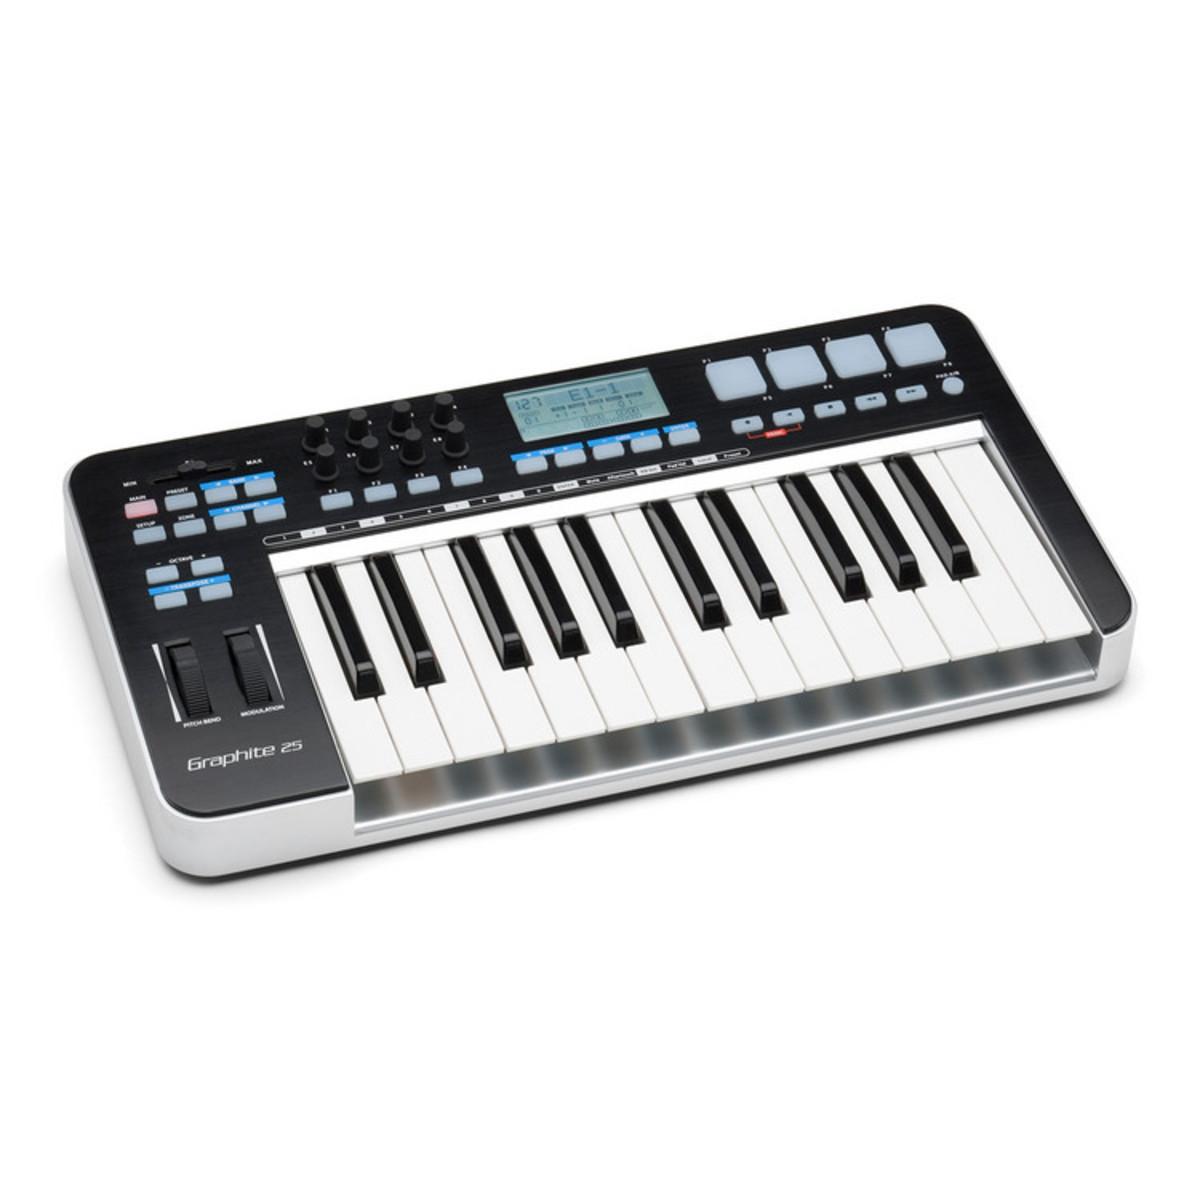 samson graphite 25 usb midi controller keyboard nearly new at gear4music. Black Bedroom Furniture Sets. Home Design Ideas